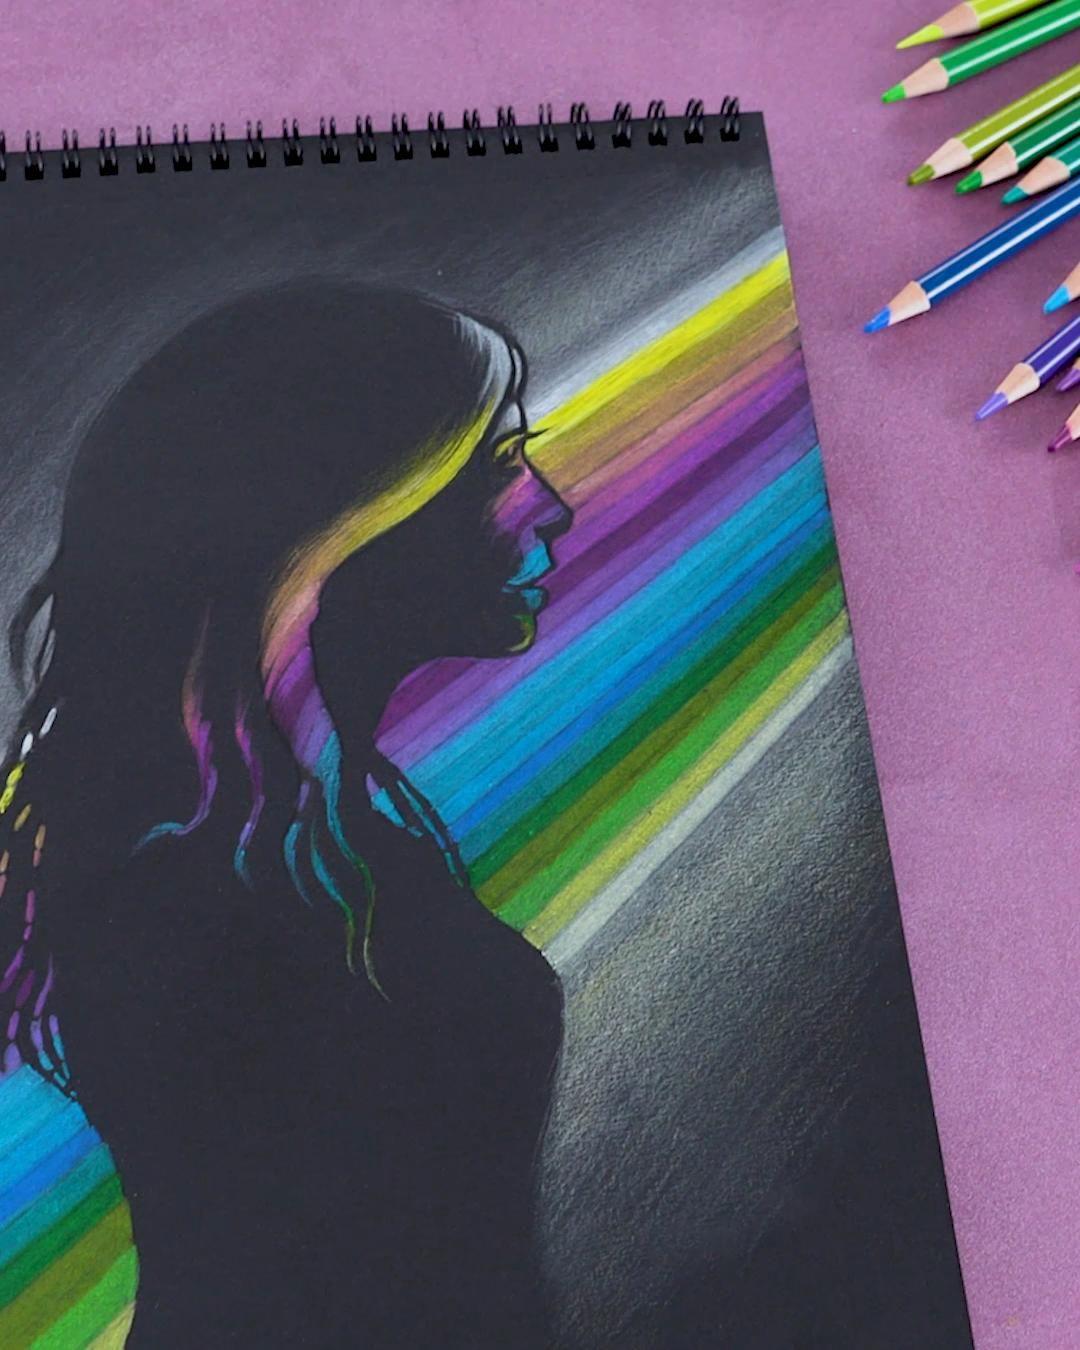 Black Paper Drawing | Arteza Colored Pencils + Handy TIPS | ARTEZA